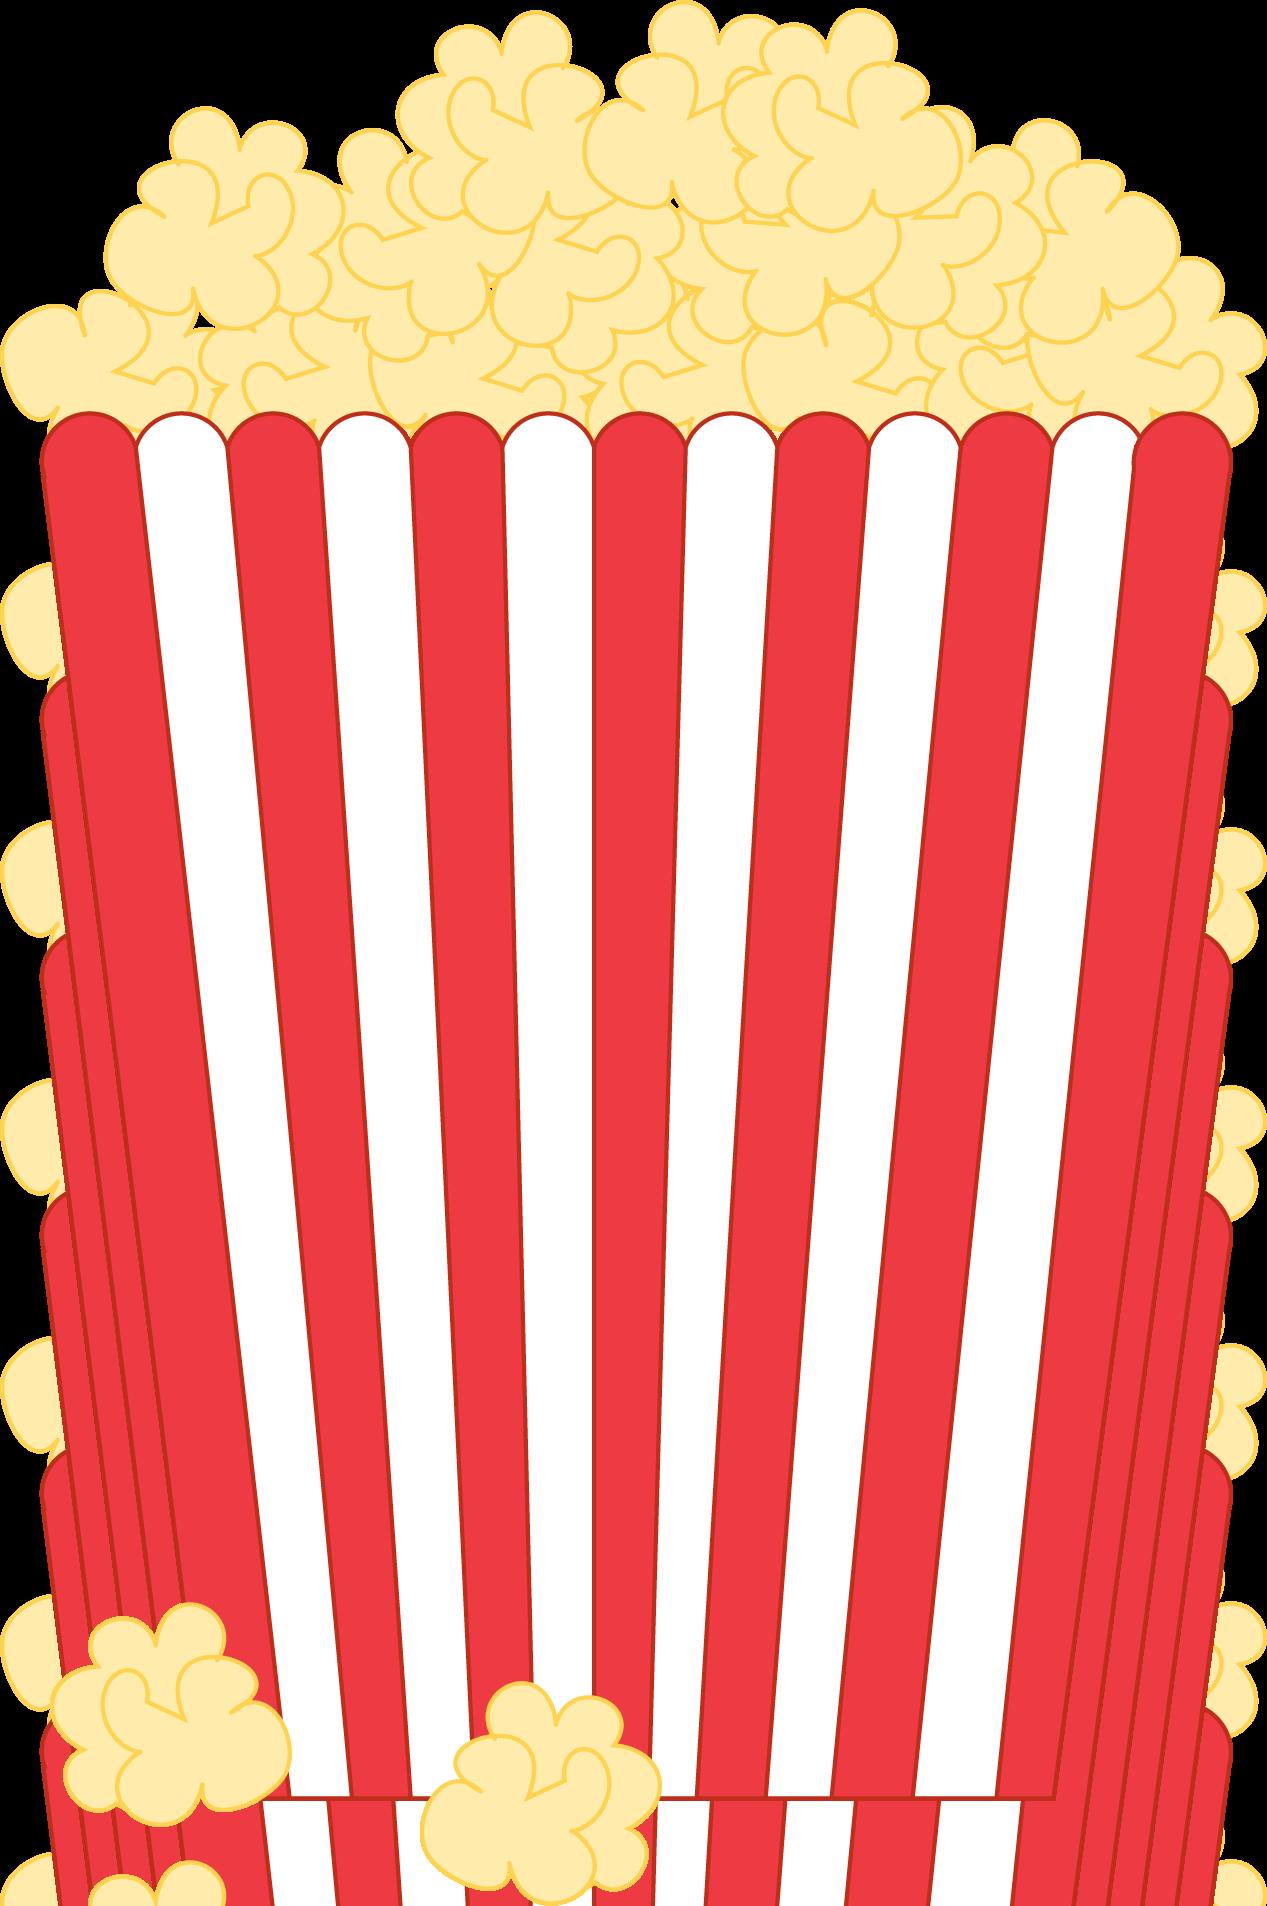 Carnival clipart clip art. Popcorn